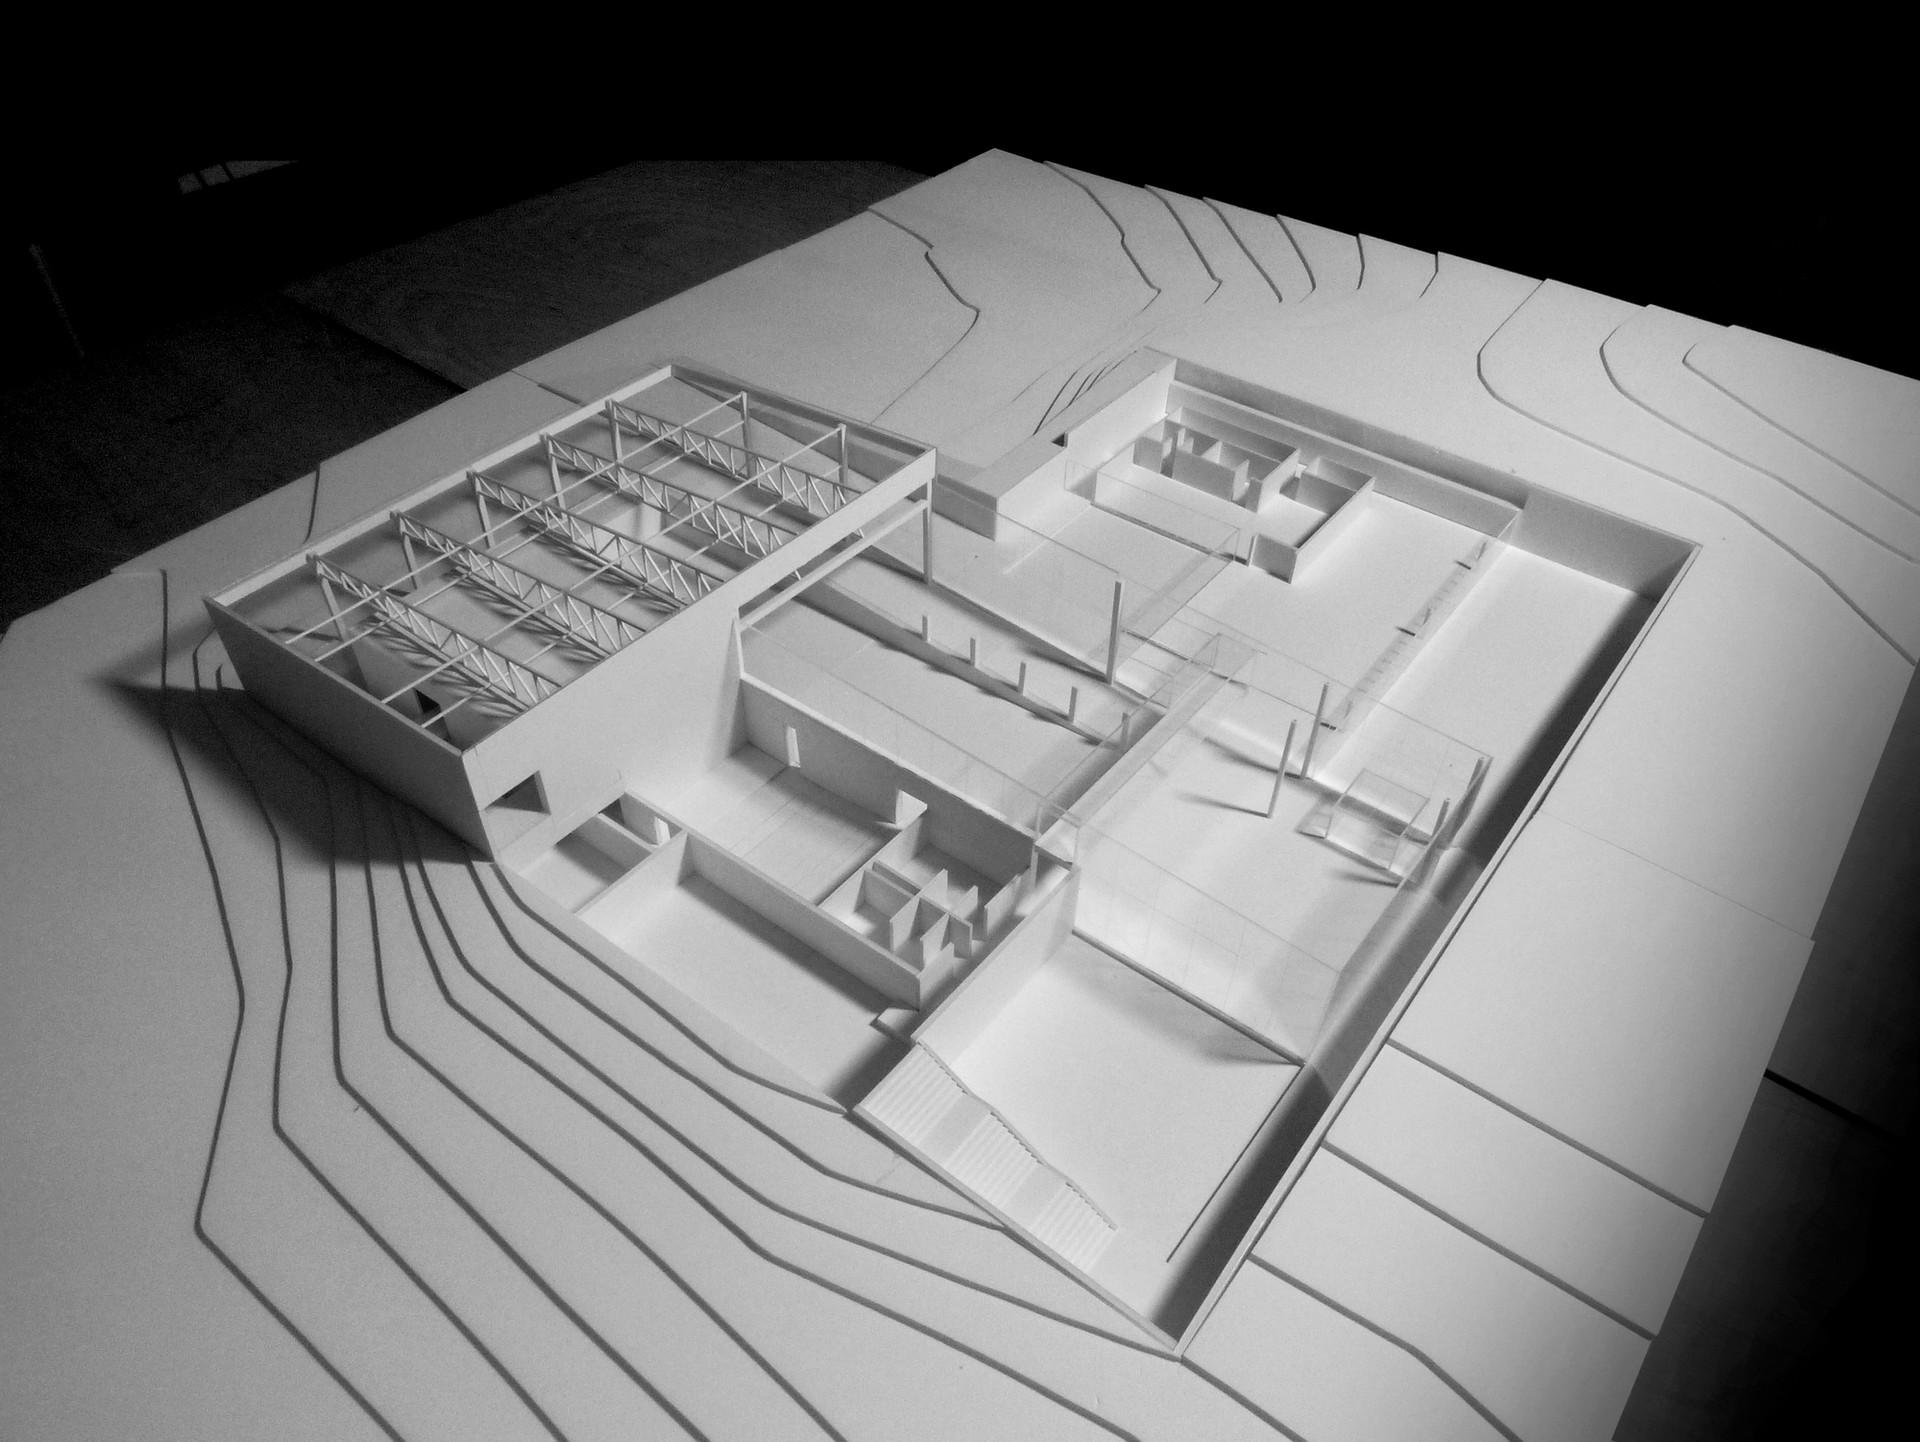 architect-k_Floating Time_scene